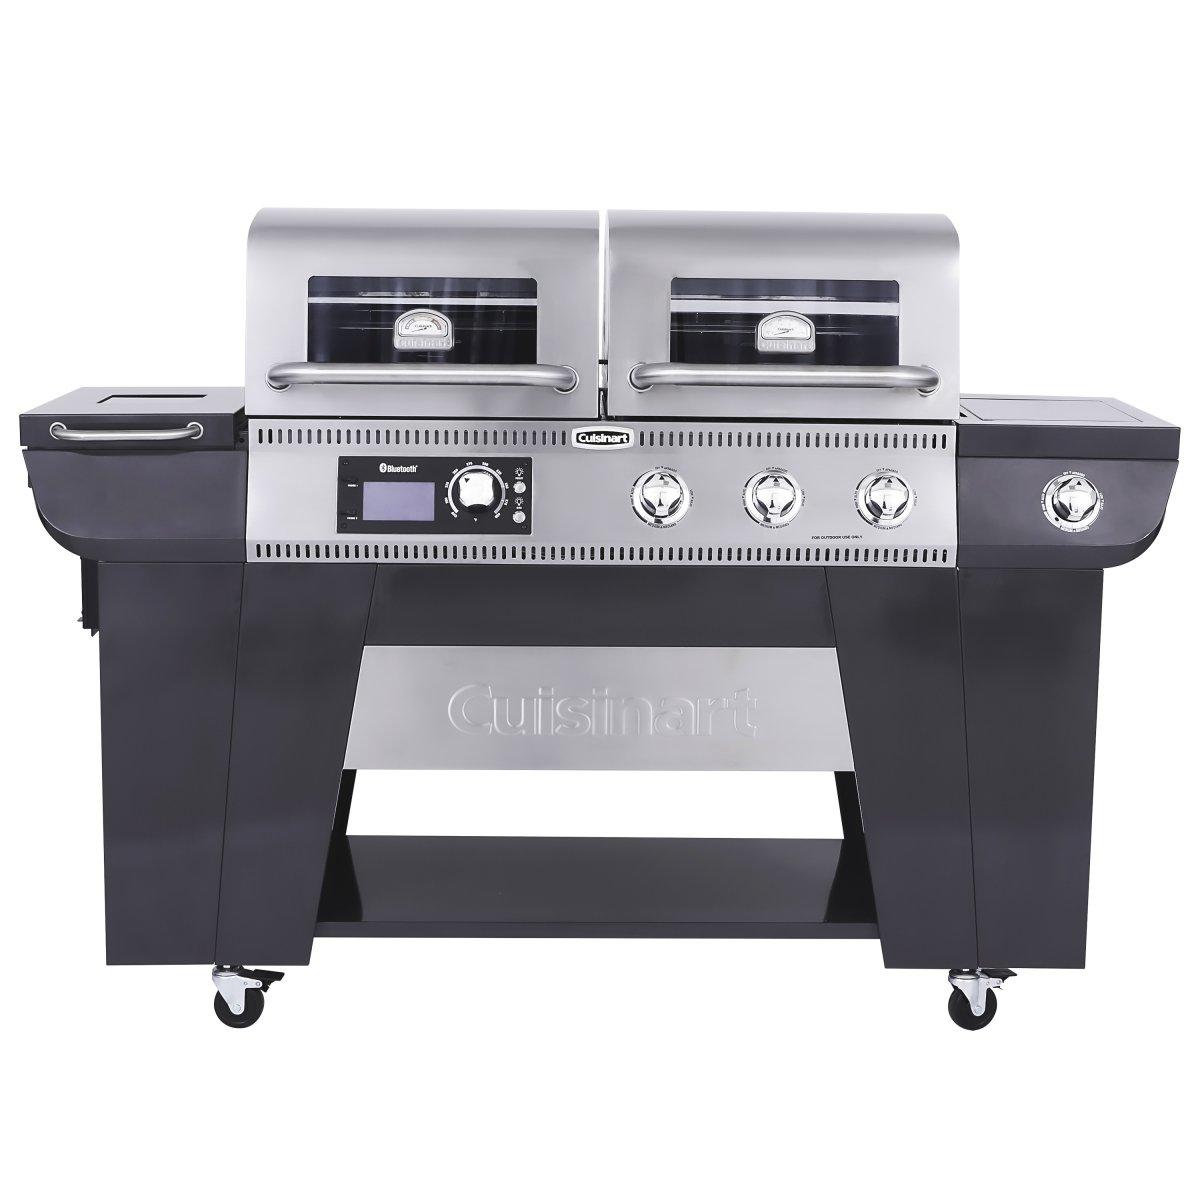 cuisinart-twinpellet-grill.jpg